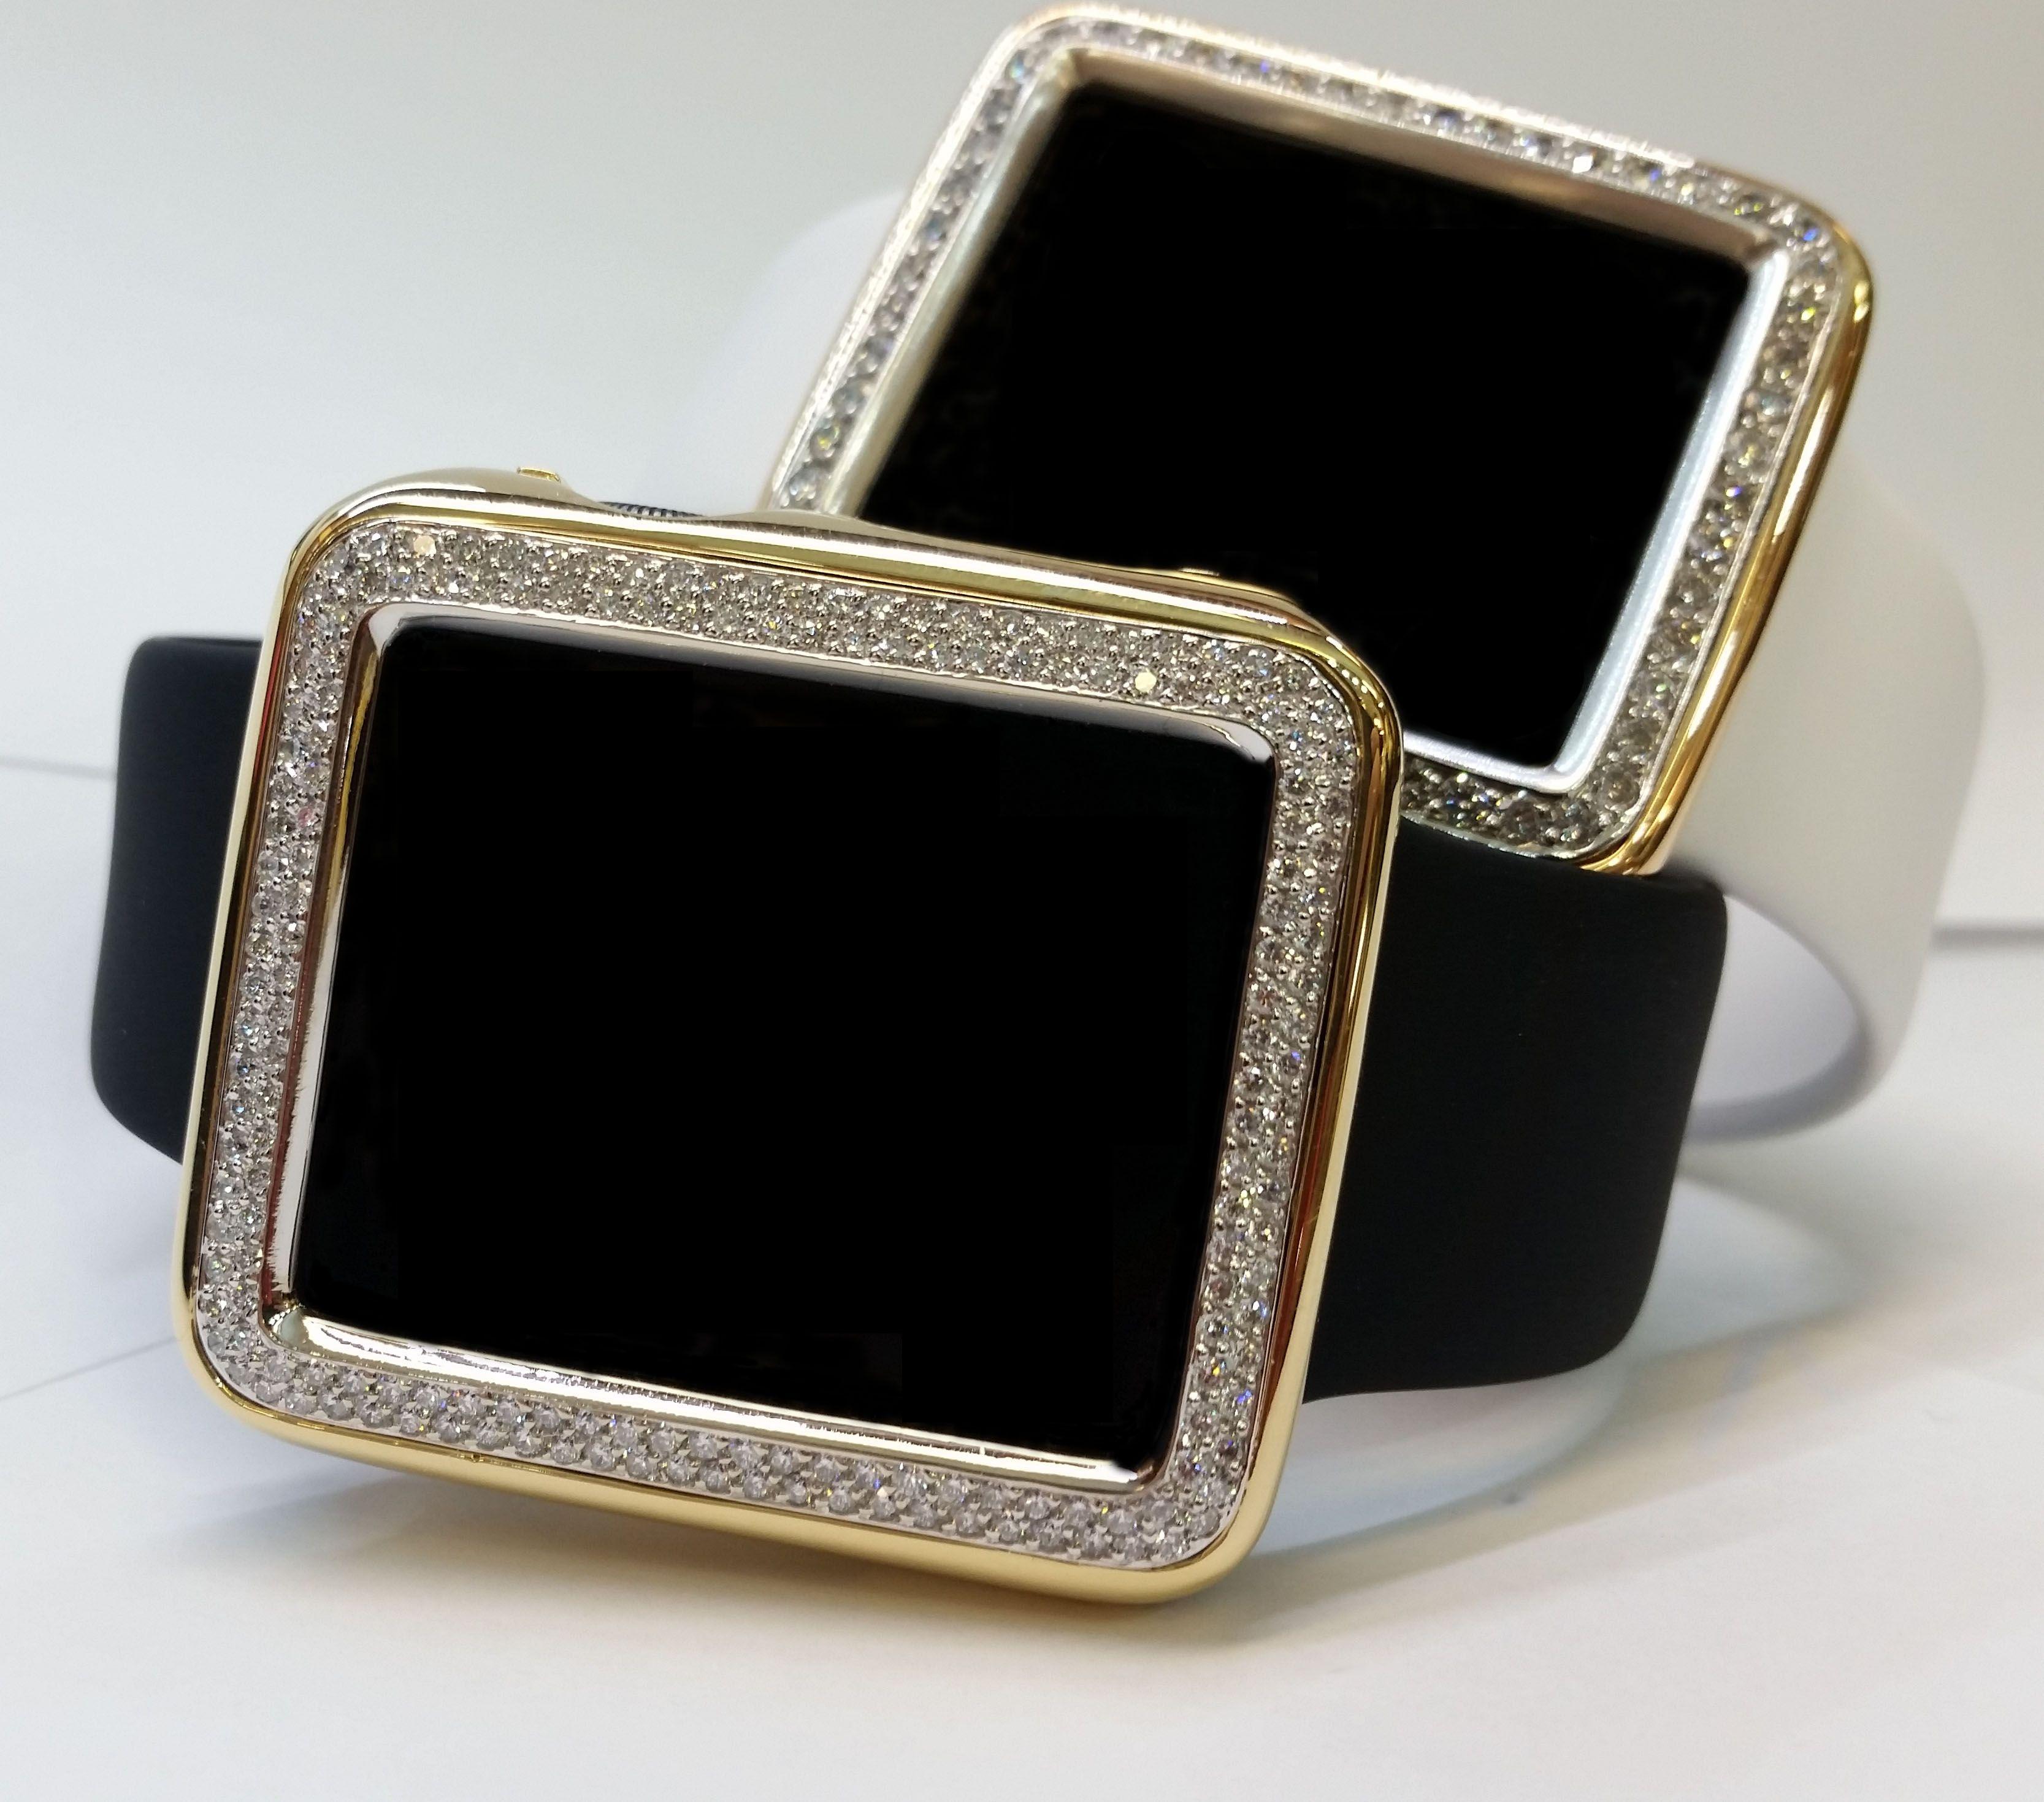 wholesale dealer 4e8e0 289cb Handcrafted Apple Watch 18kt gold case with diamond bezel | diamond ...